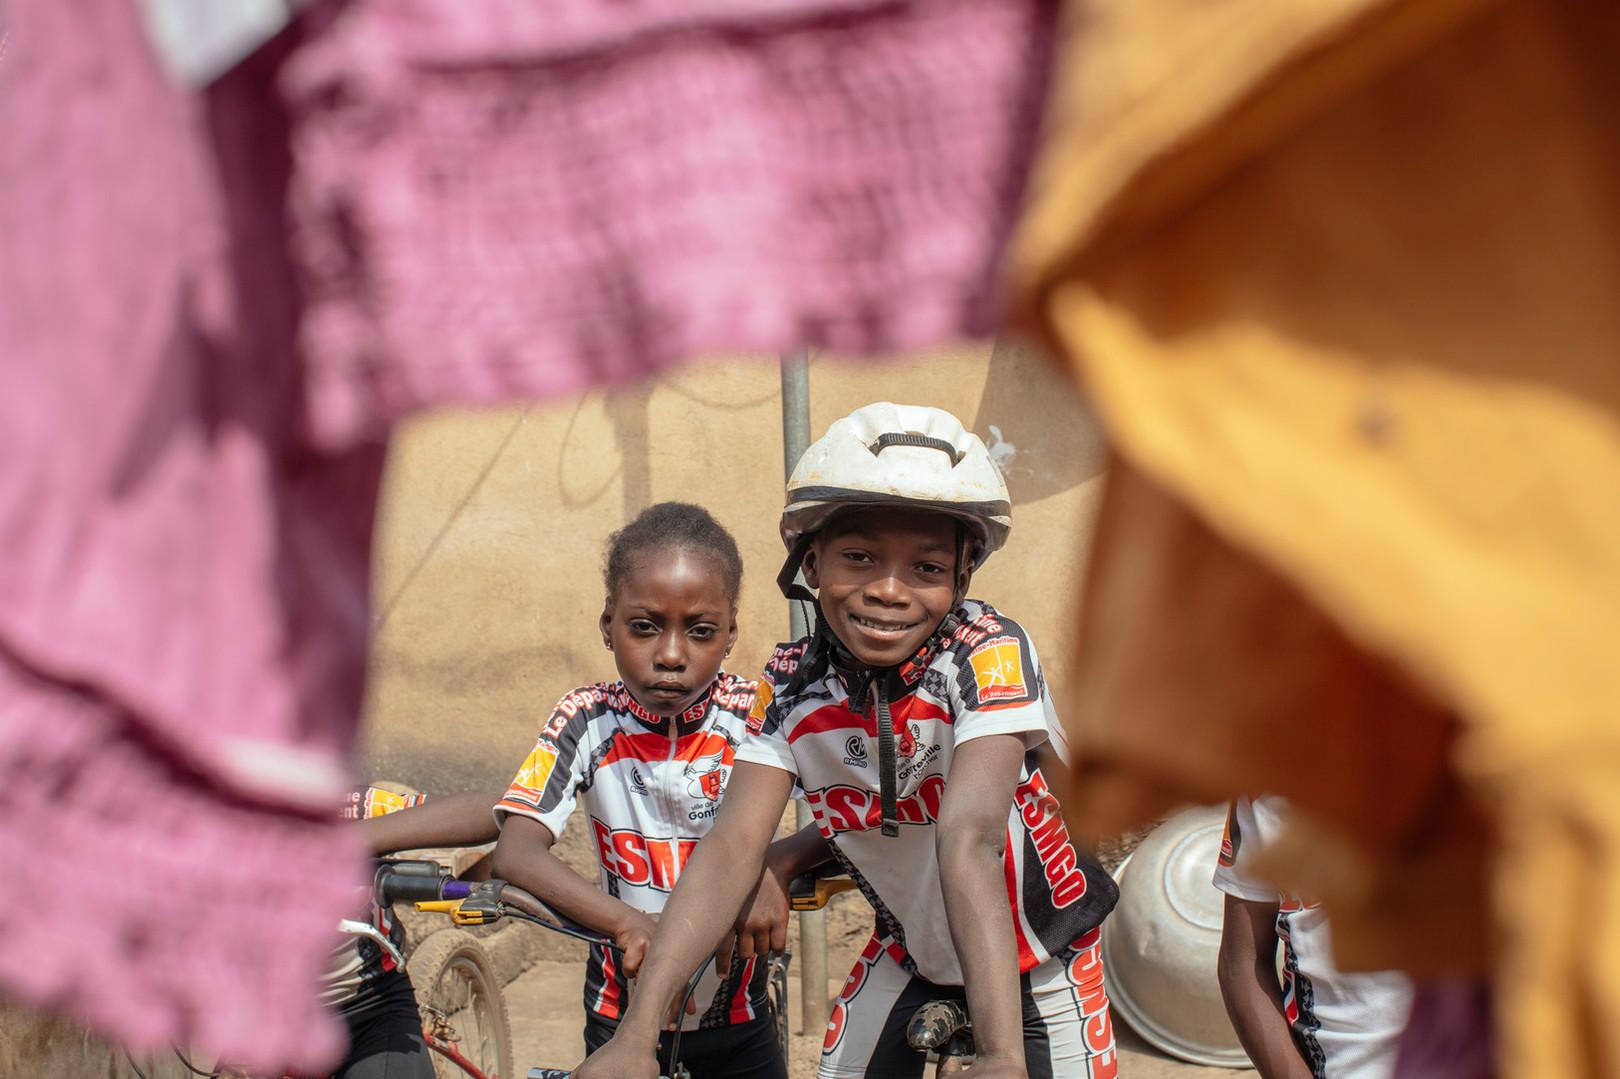 0051_Togo_KpaliméCyclingProject_20151220